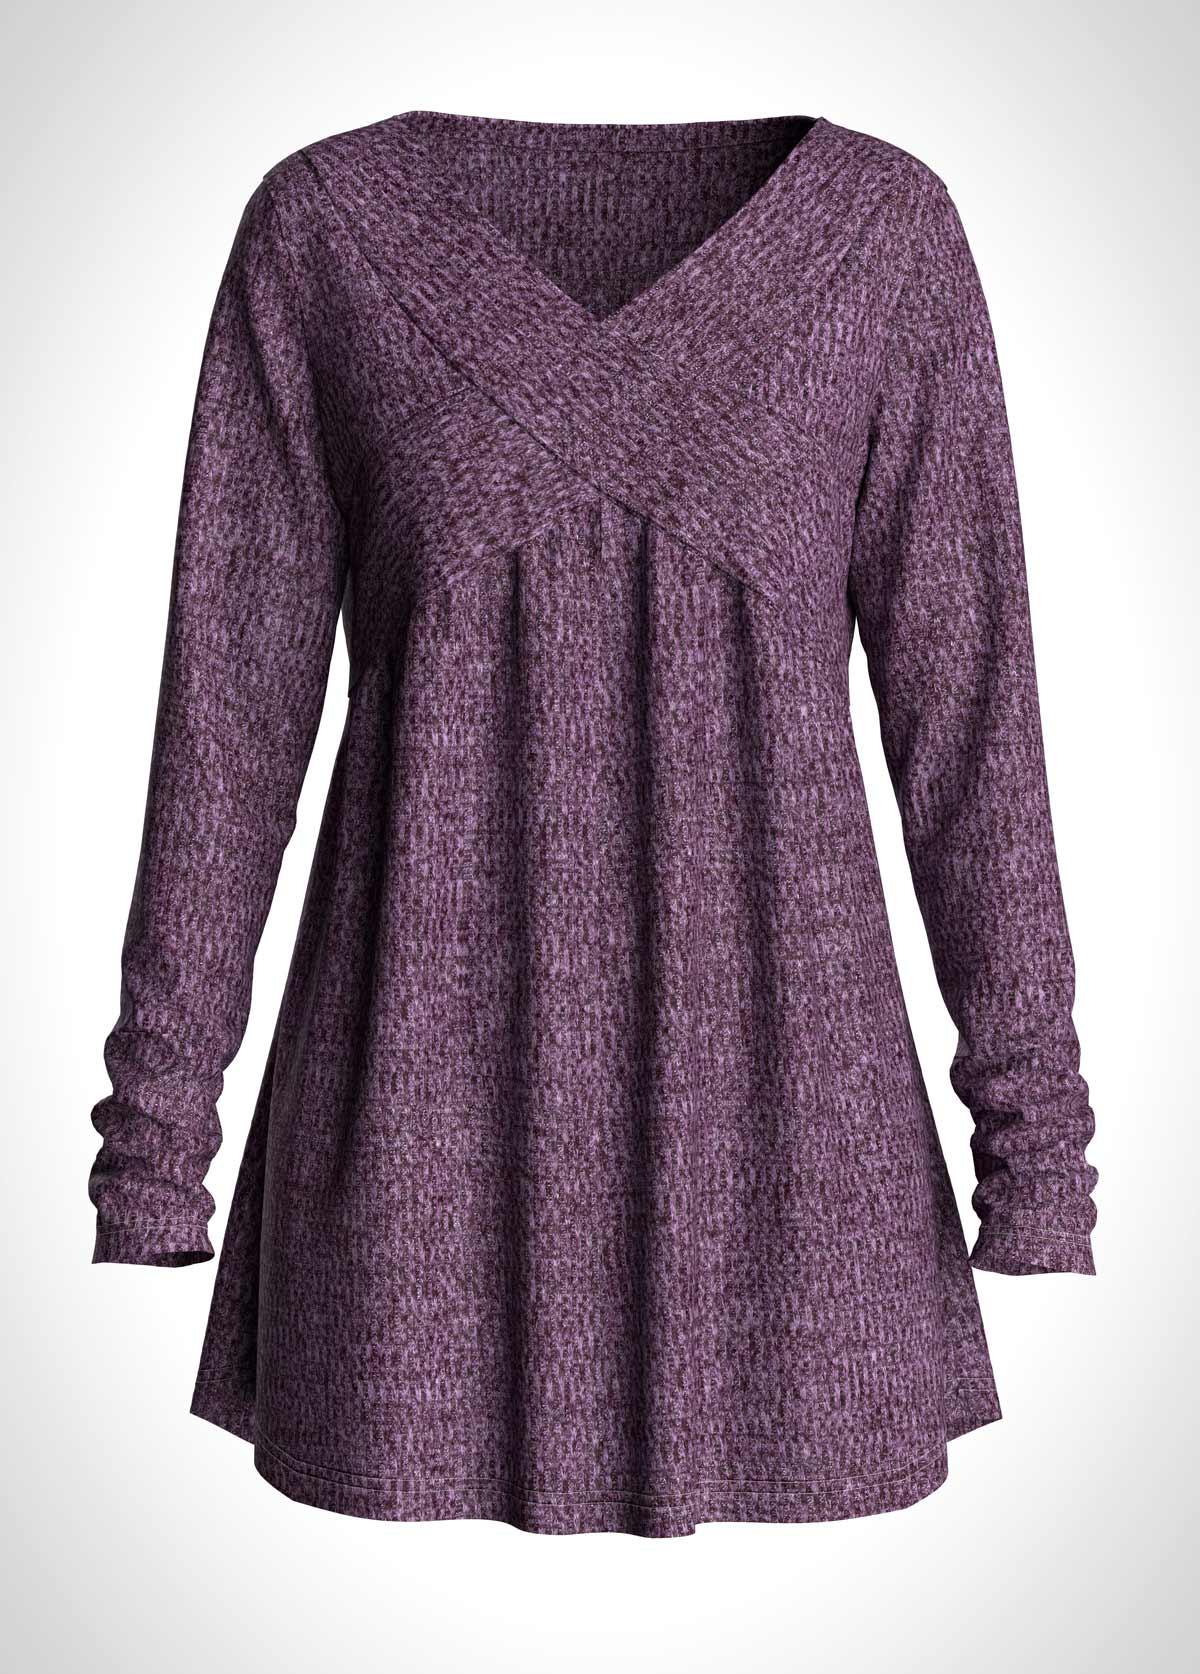 ROTITA Plus Size Solid V Neck Long Sleeve T Shirt